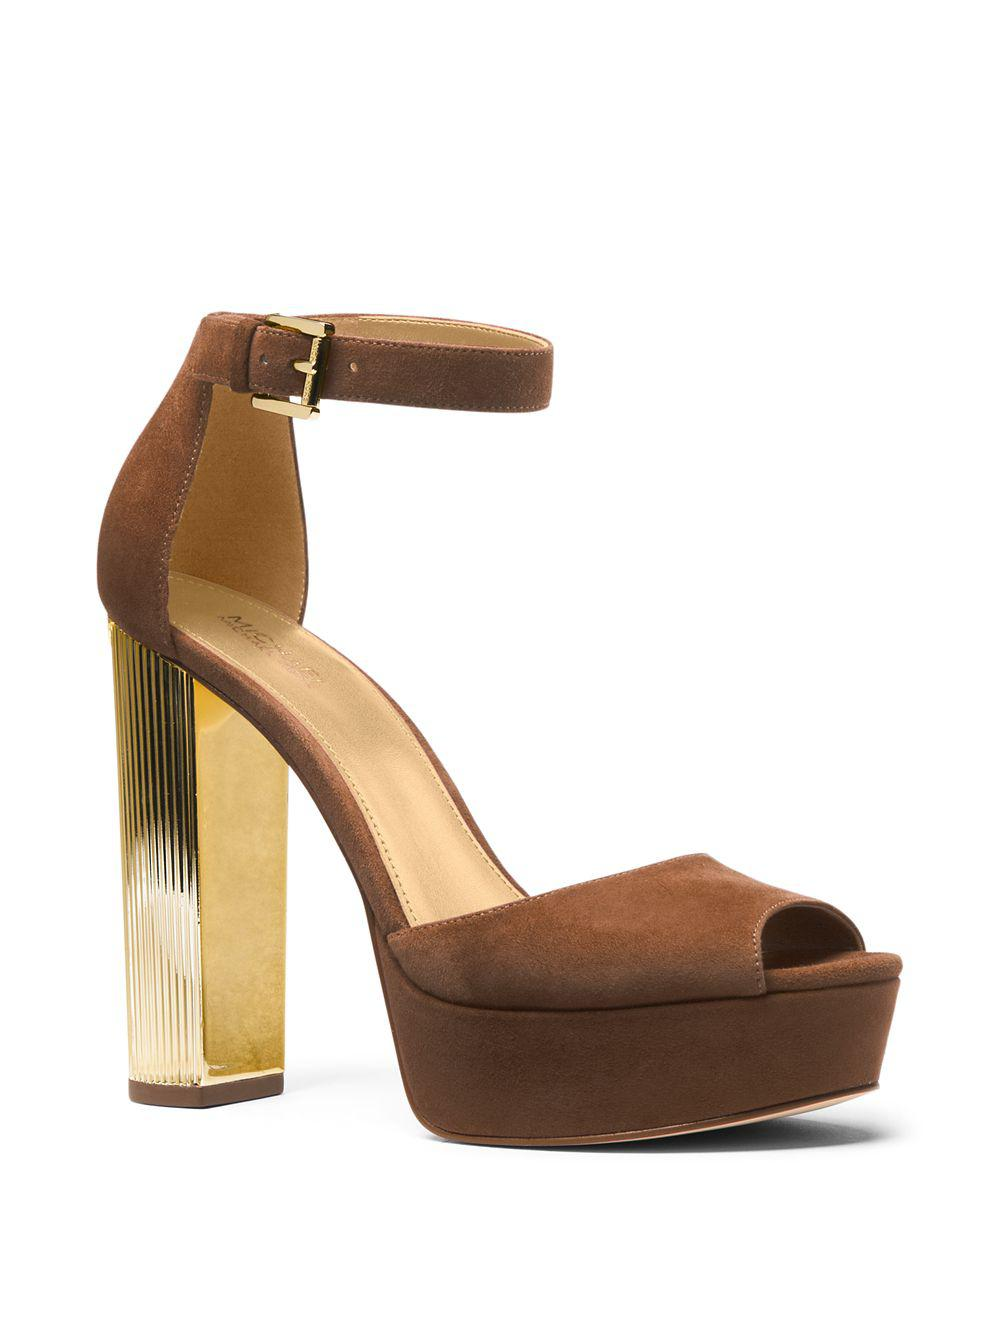 ac7db73b013a Michael Michael Kors Paloma Suede Platform Dress Sandals in Brown - Lyst